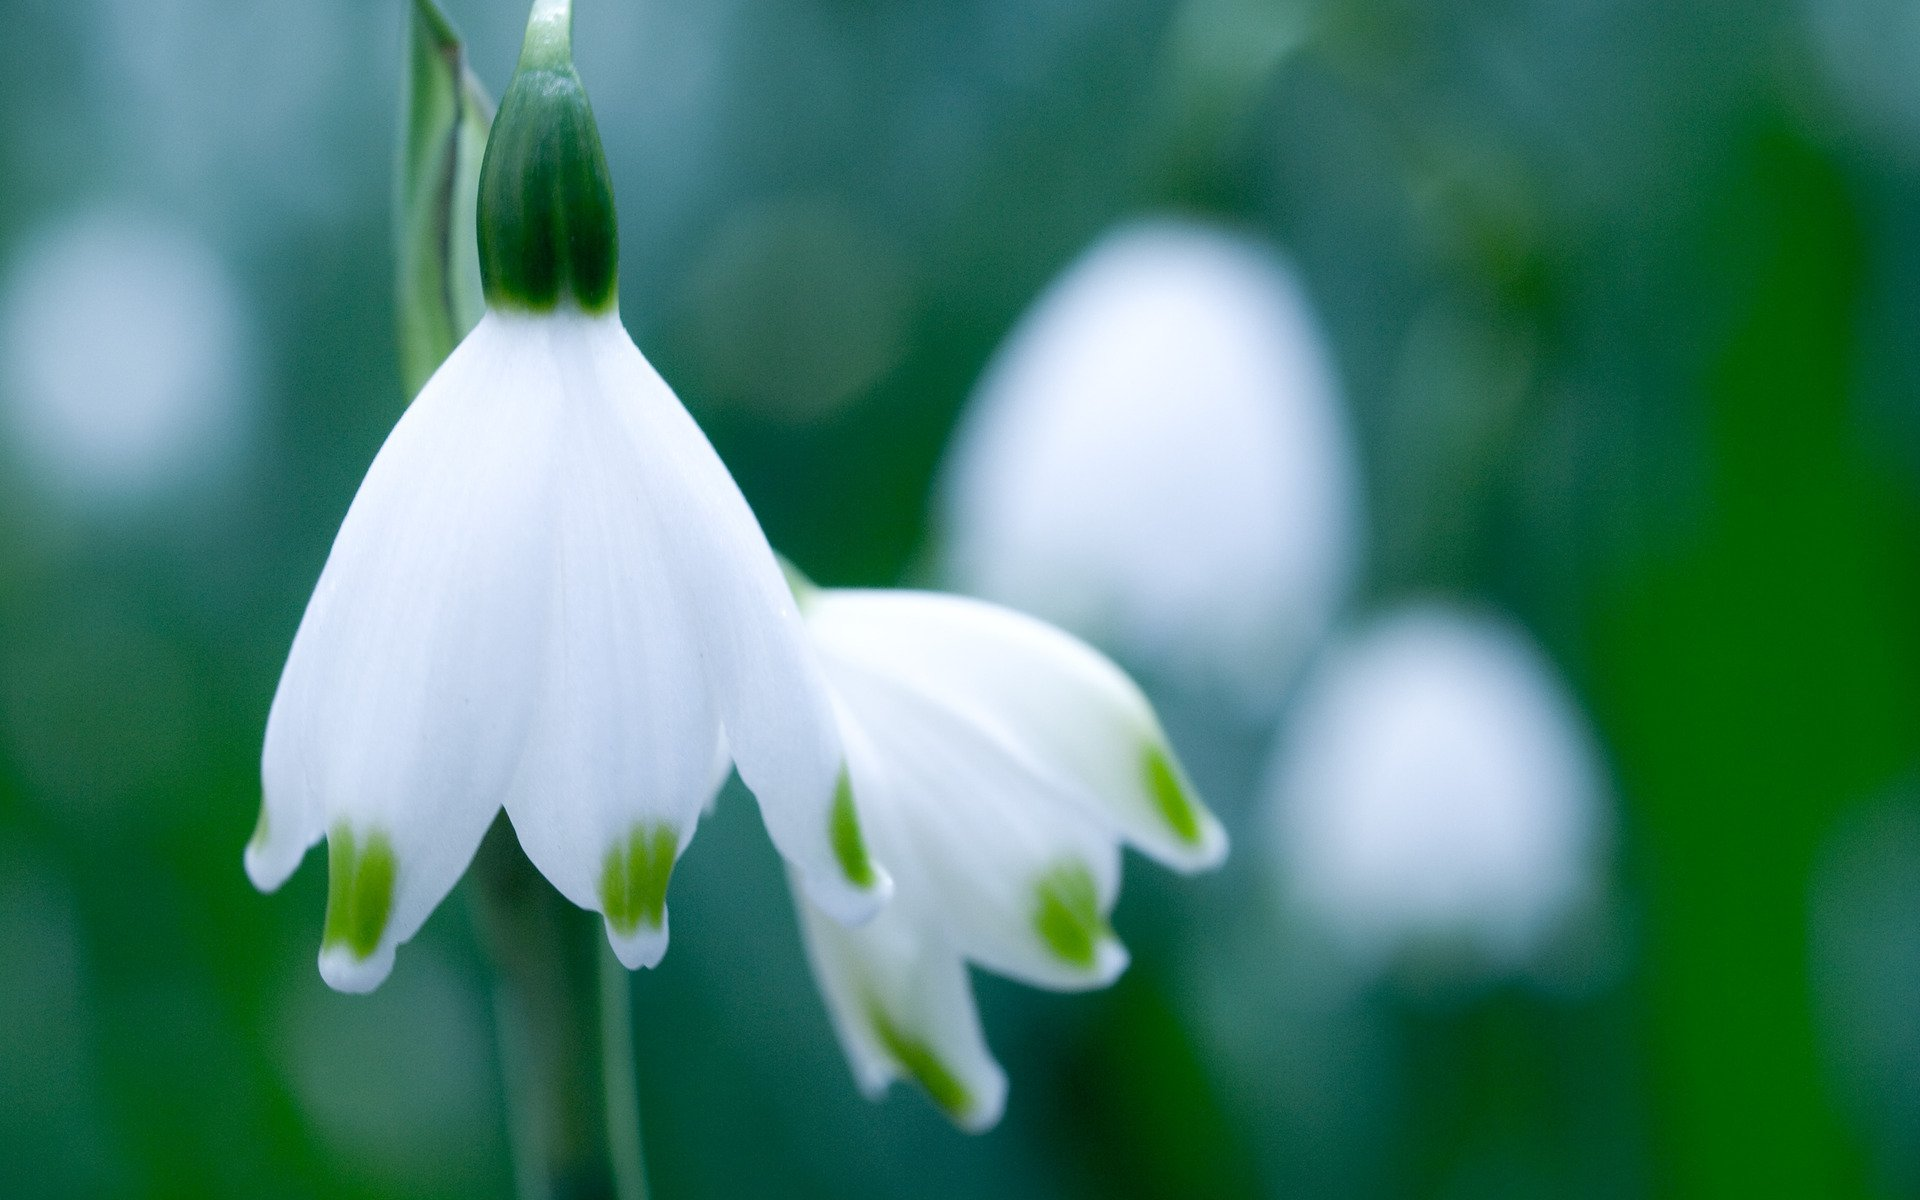 Earth - Snowdrop  Flower Wallpaper